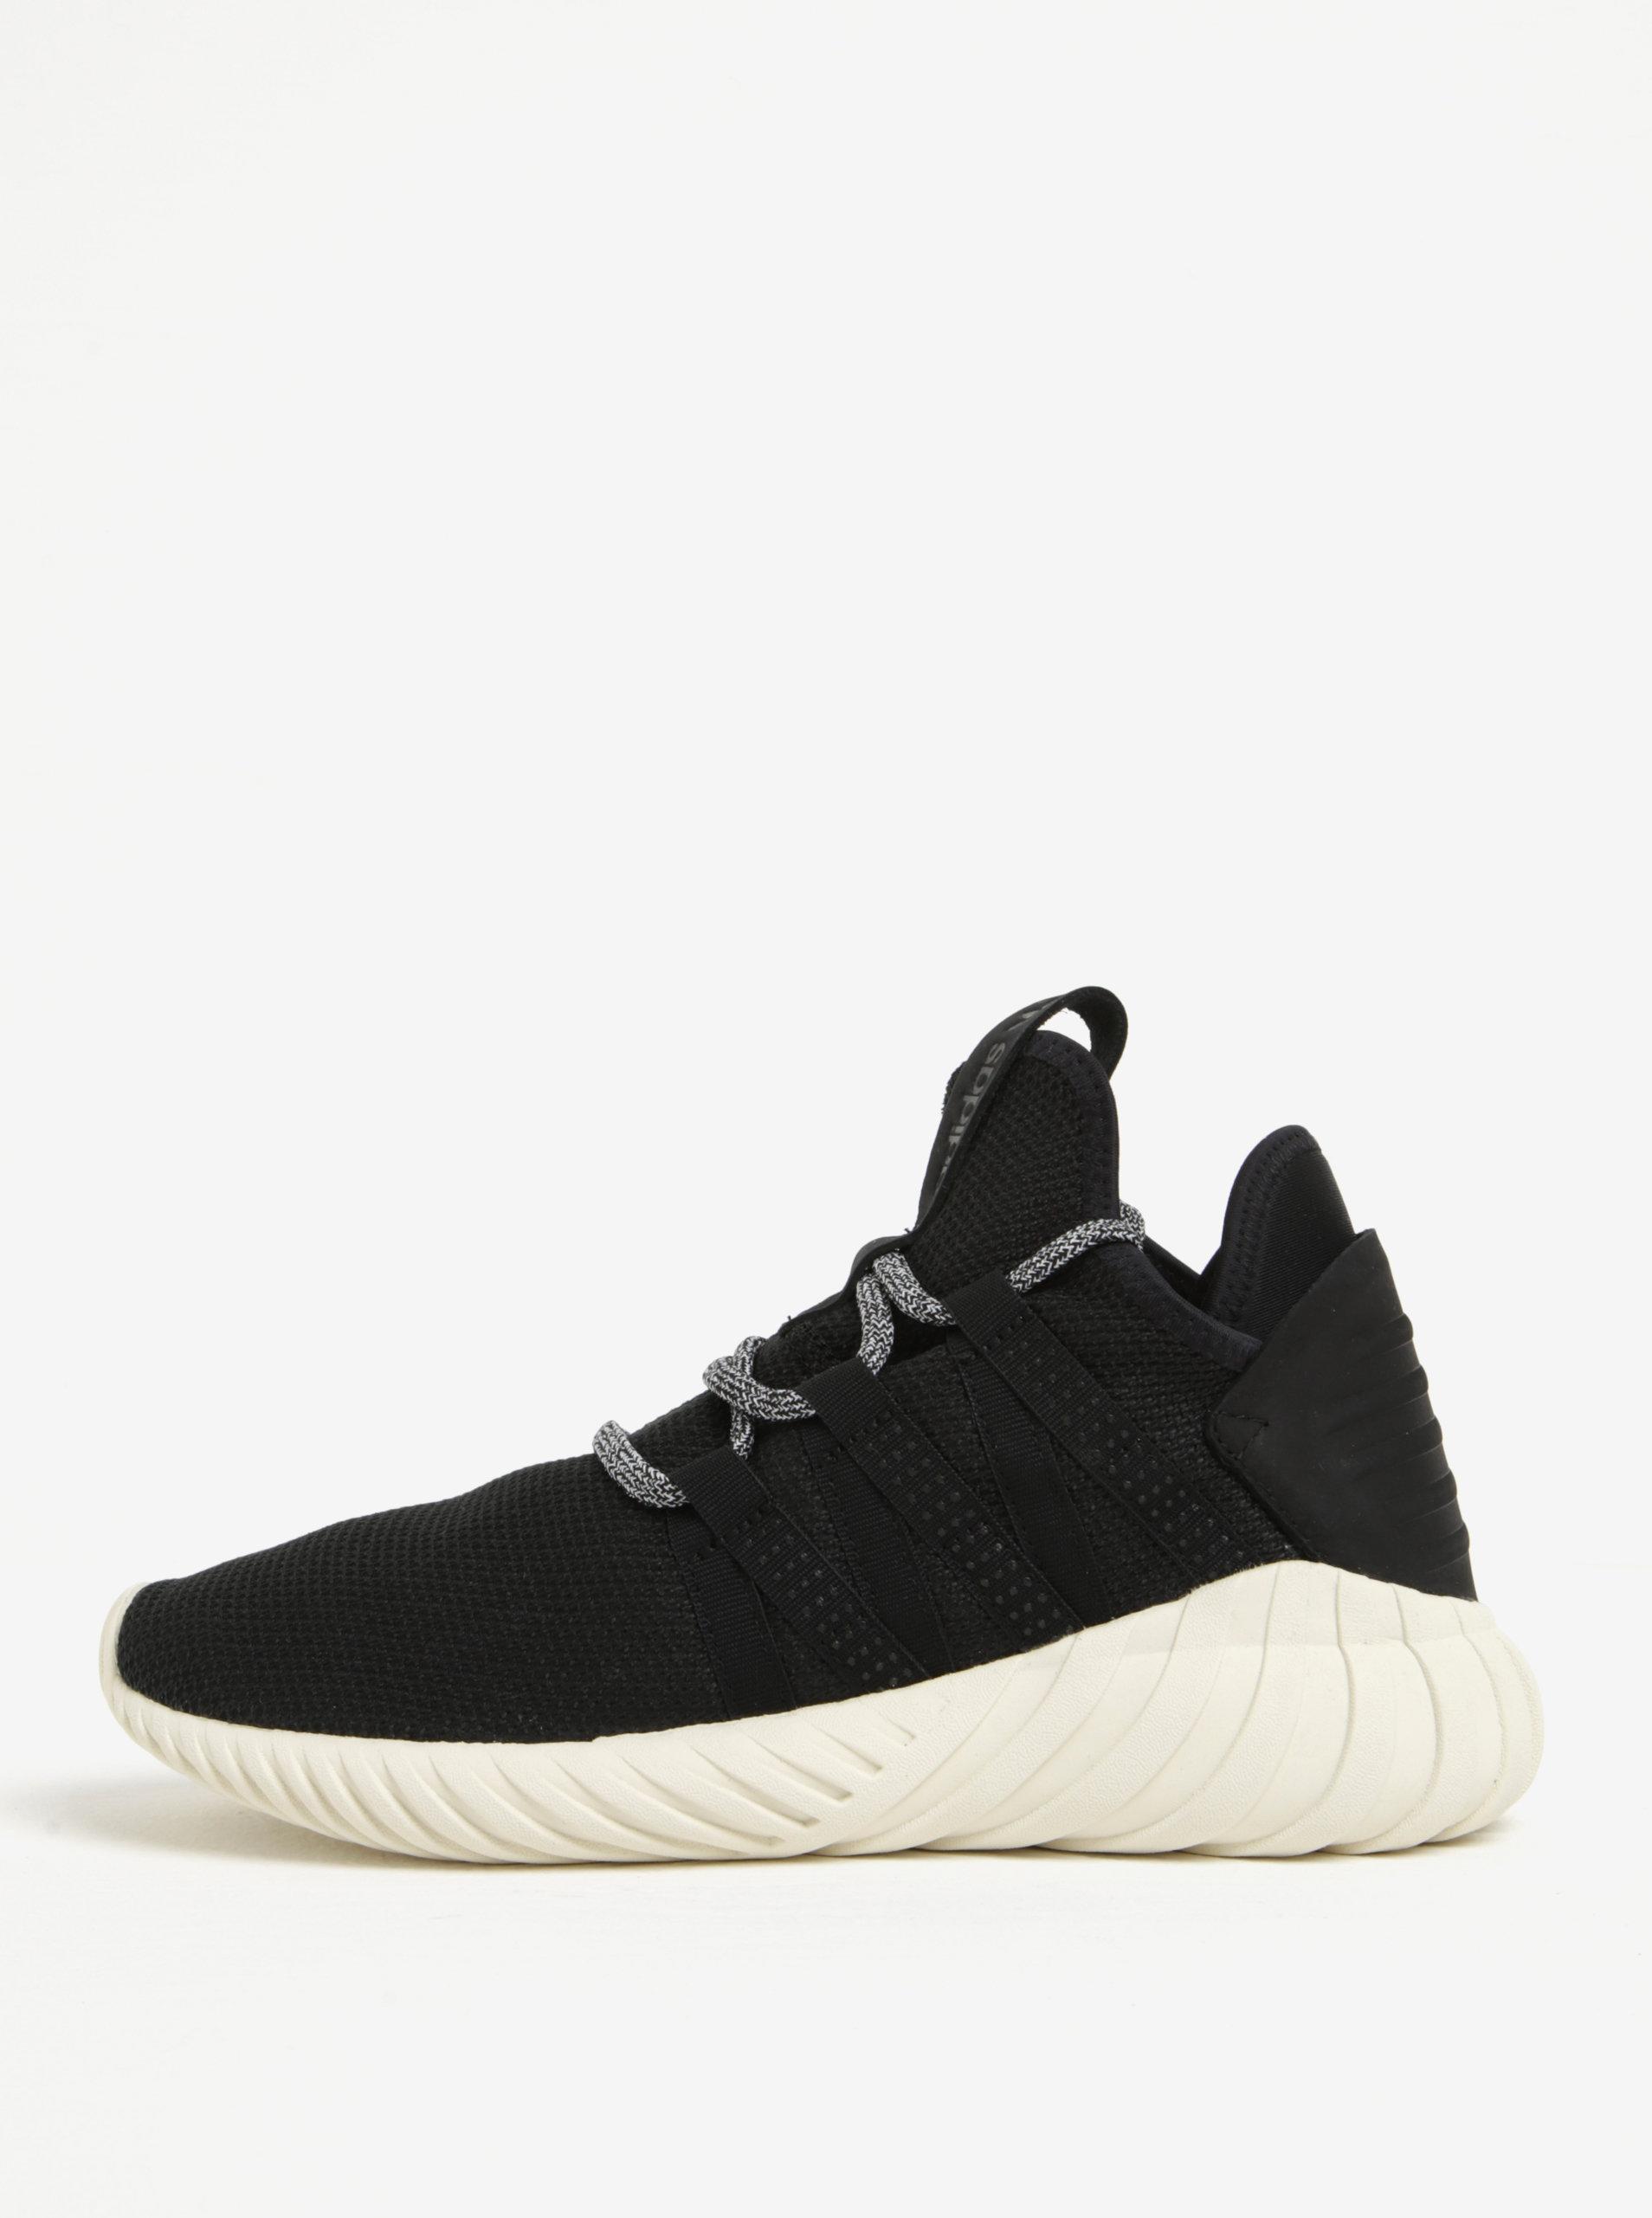 Čierne dámske tenisky adidas Originals Tubular ... ba8717d0754